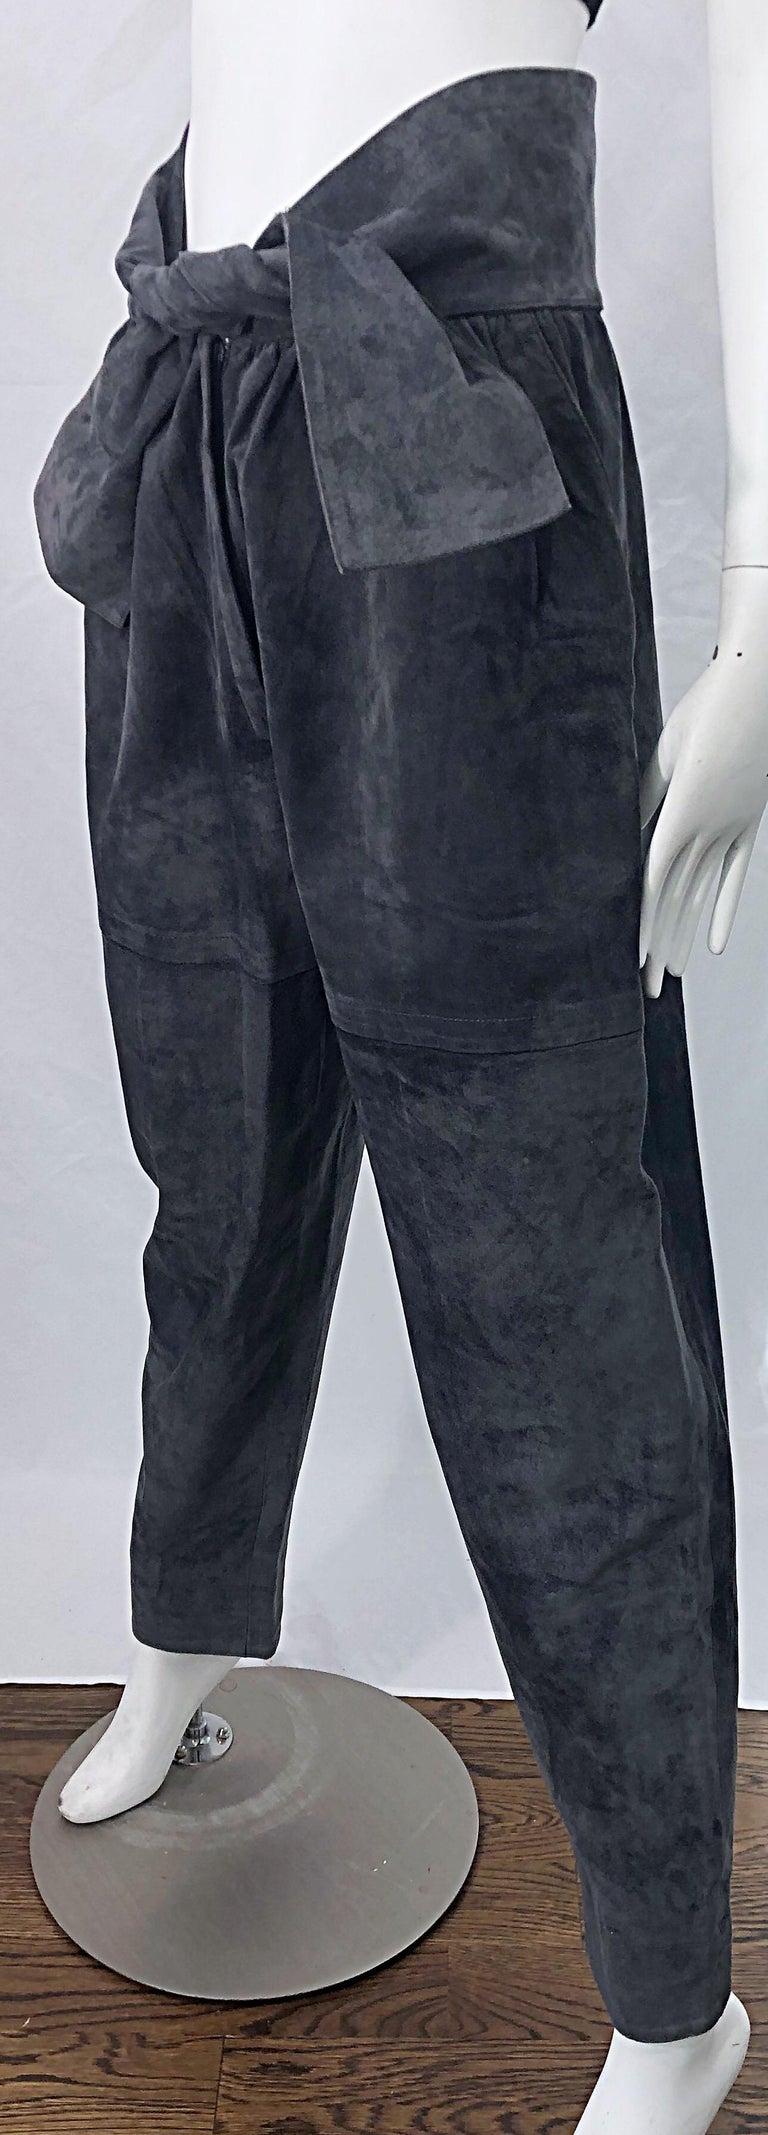 Vintage Yves Saint Laurent YSL 1980s Grey Suede Leather High Waisted Harem Pants For Sale 4